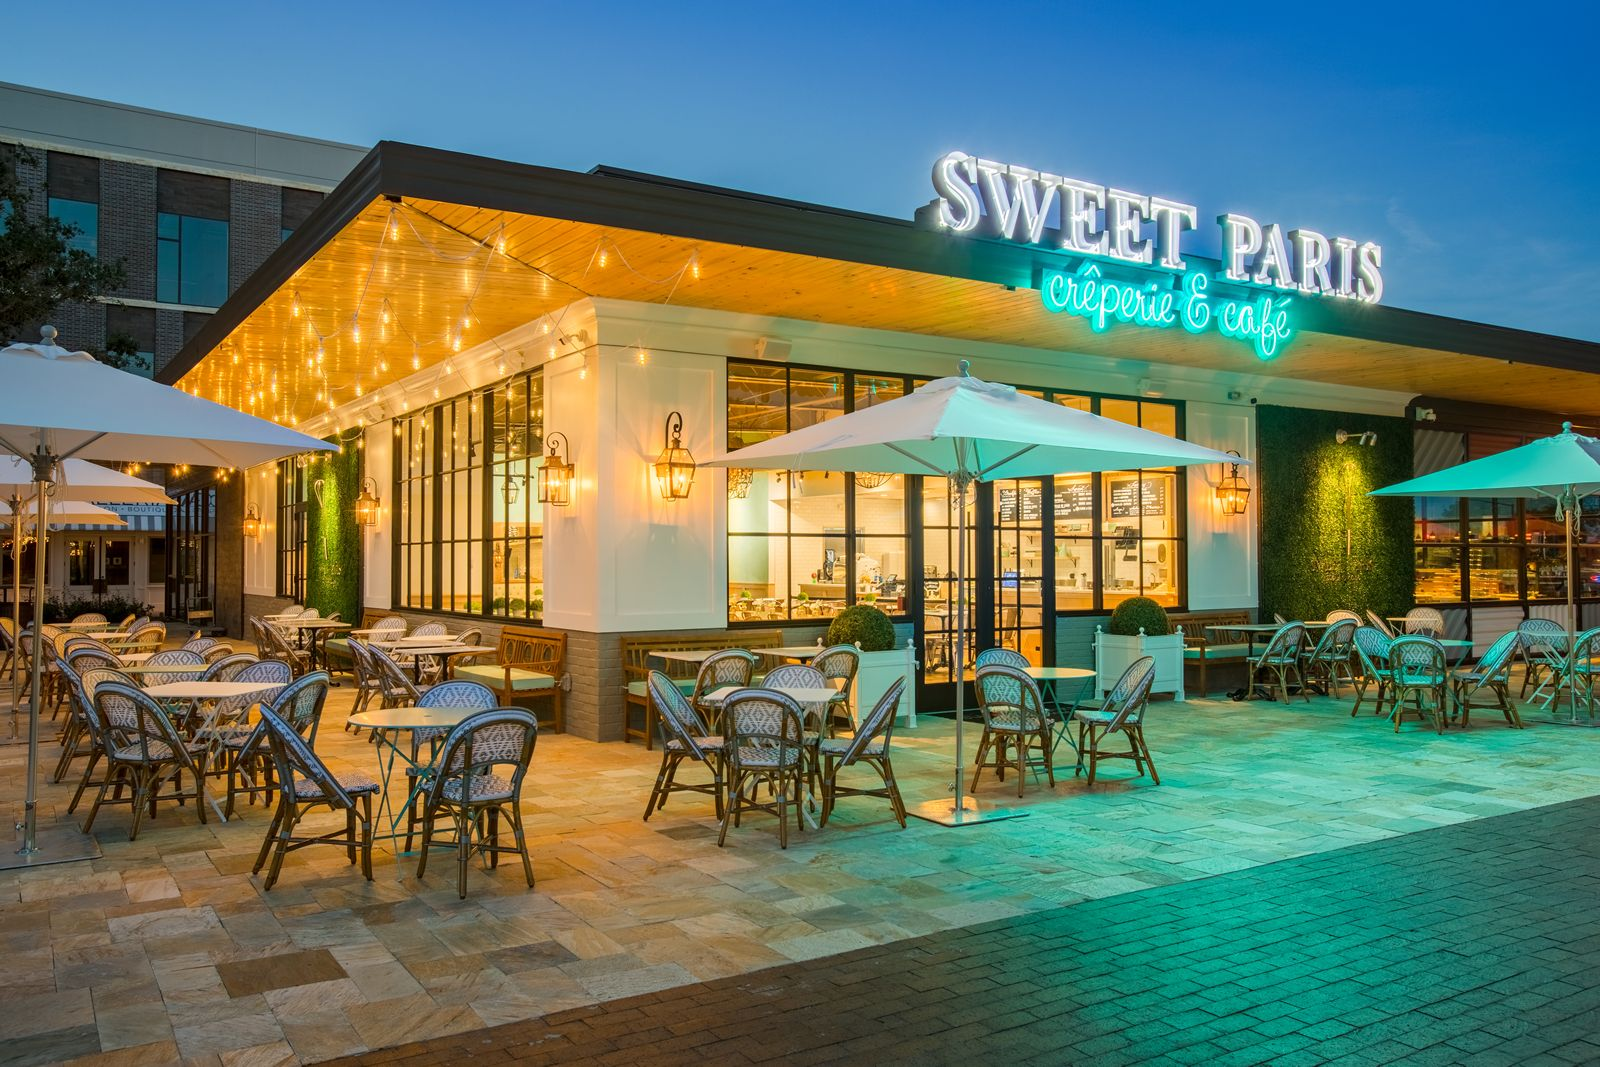 Sweet Paris, the Famous Texan Crêperie & Café Expands to Dallas and Miami